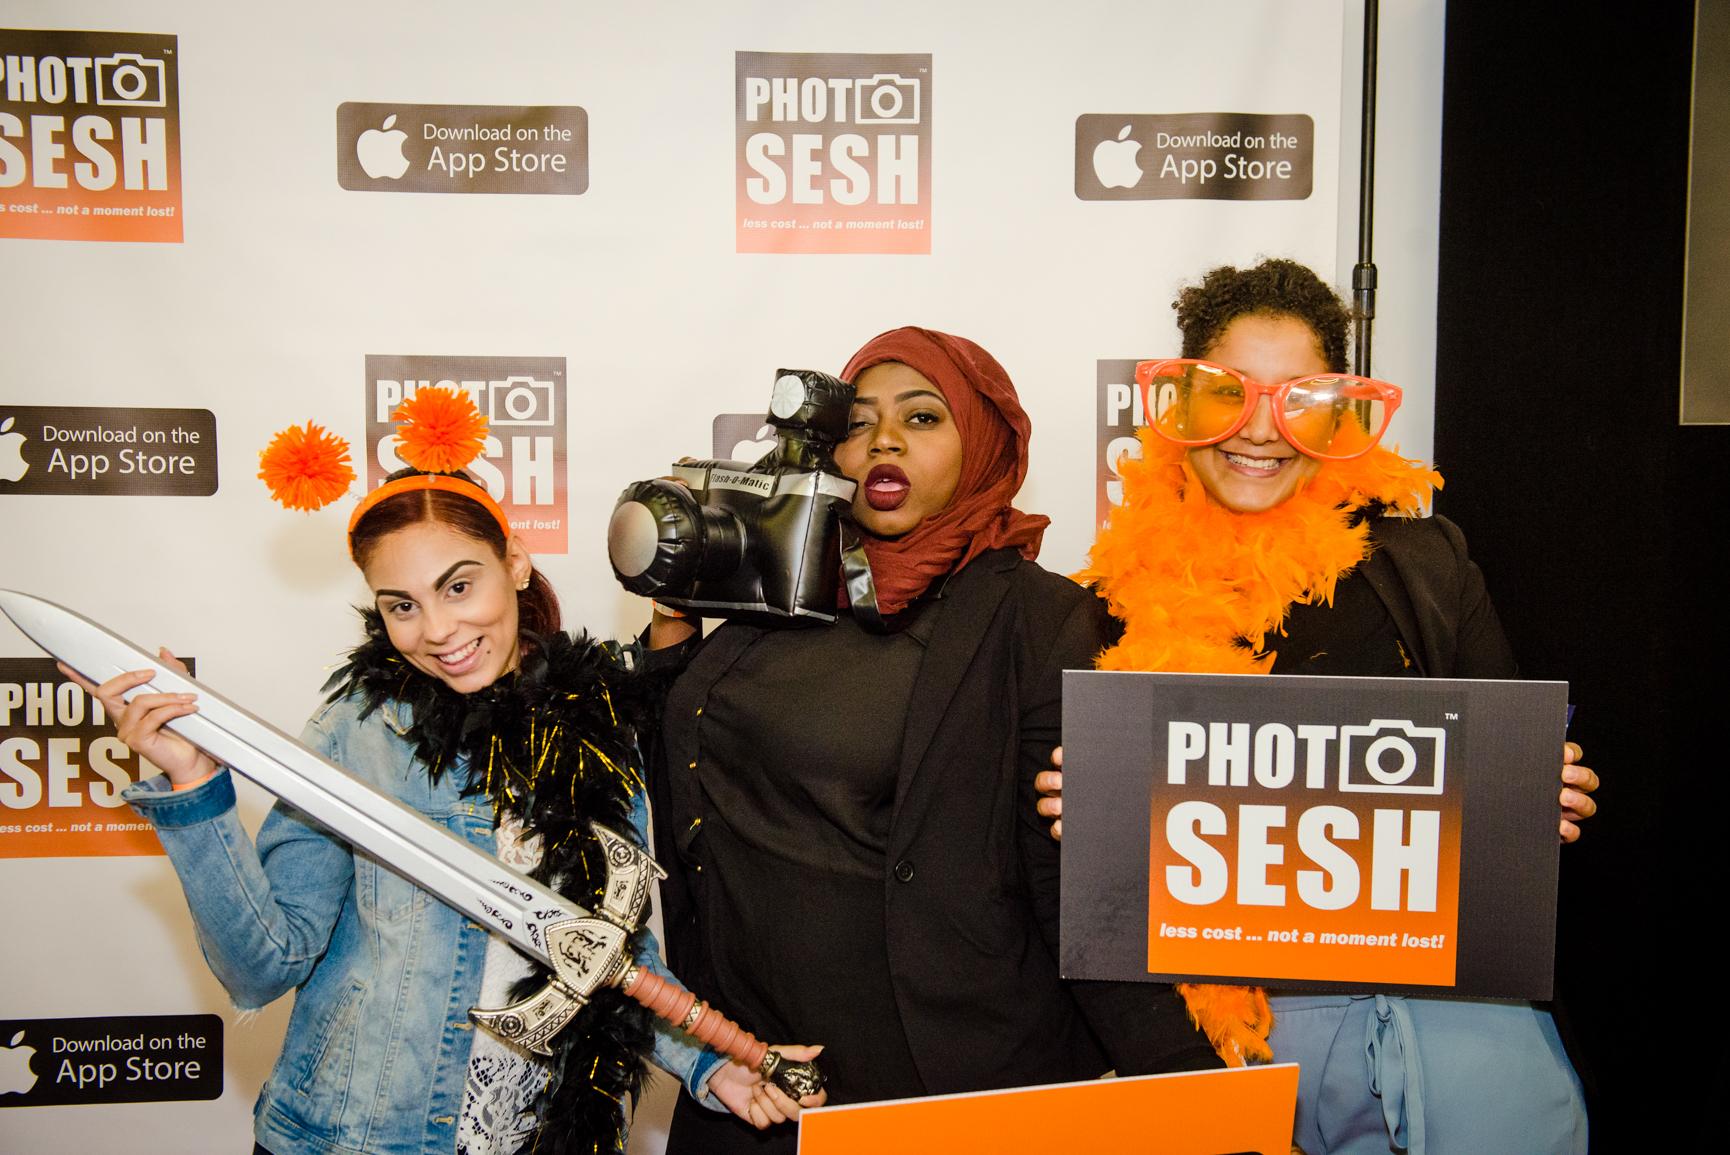 2016-04-21 Photo Sesh Tech Day - Pier 92 & 94 - NYC-3863.jpg